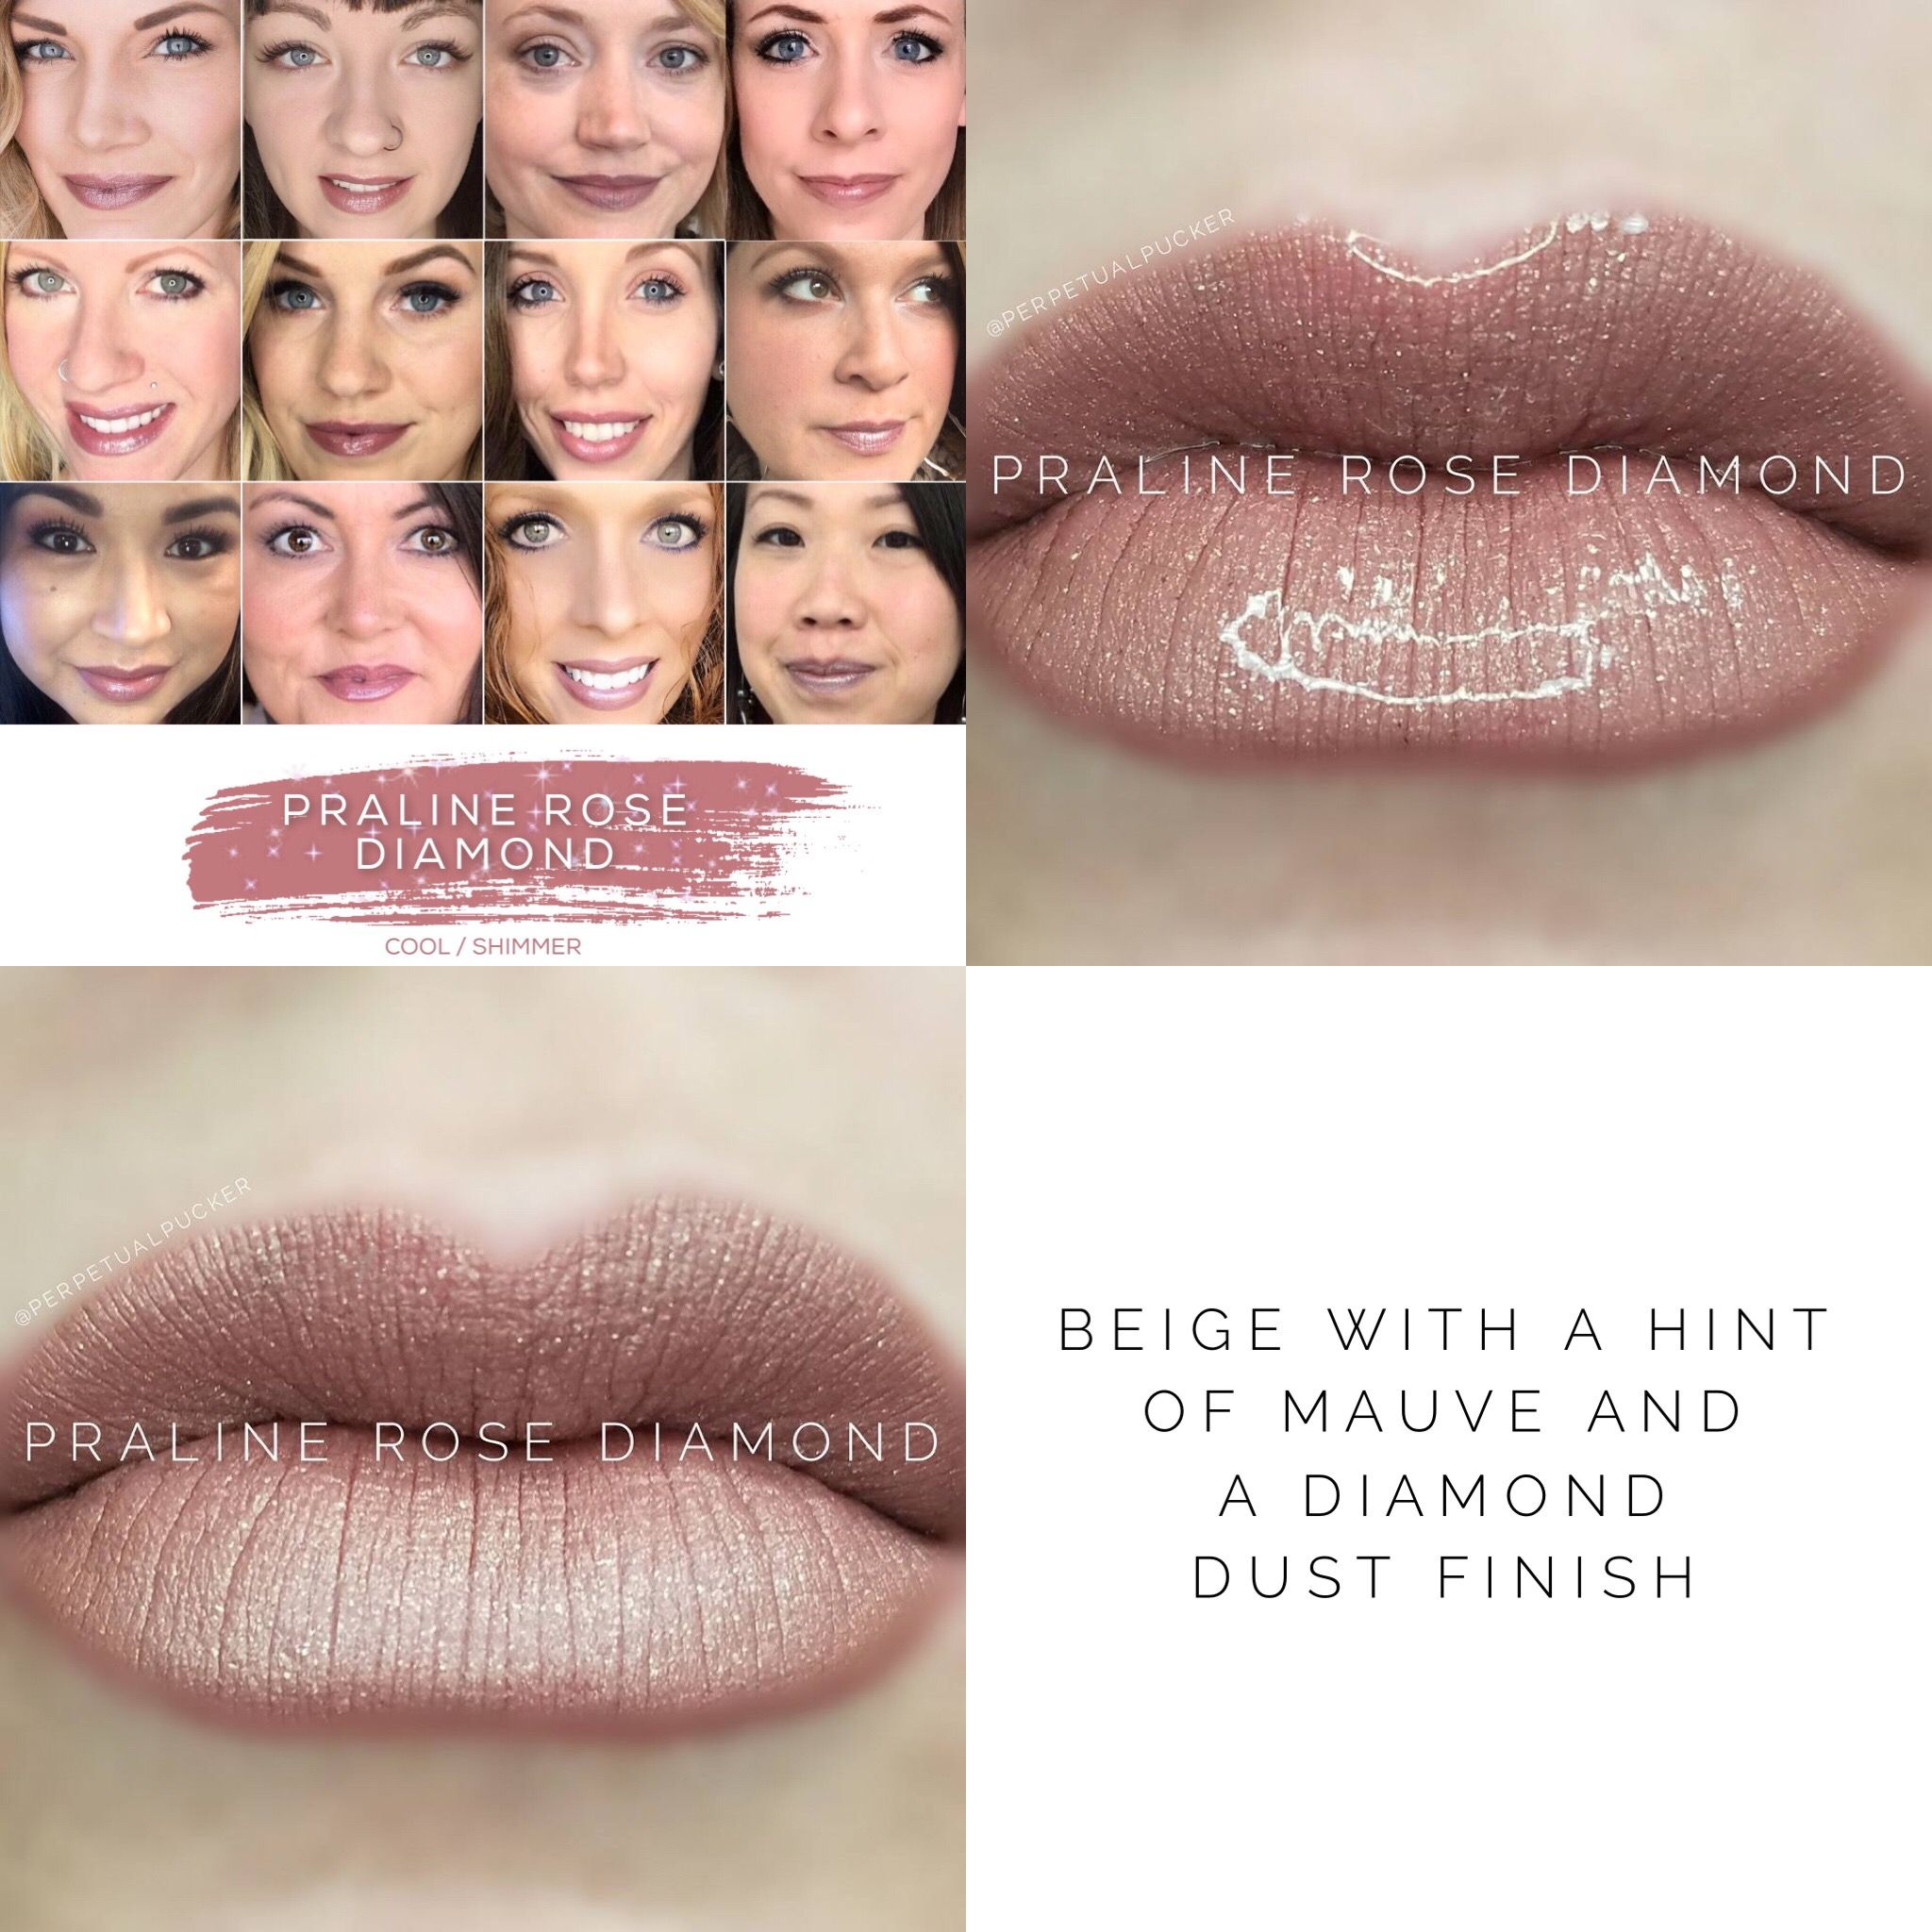 Praline Rose Diamond Lipsense Lipsense Pinterest